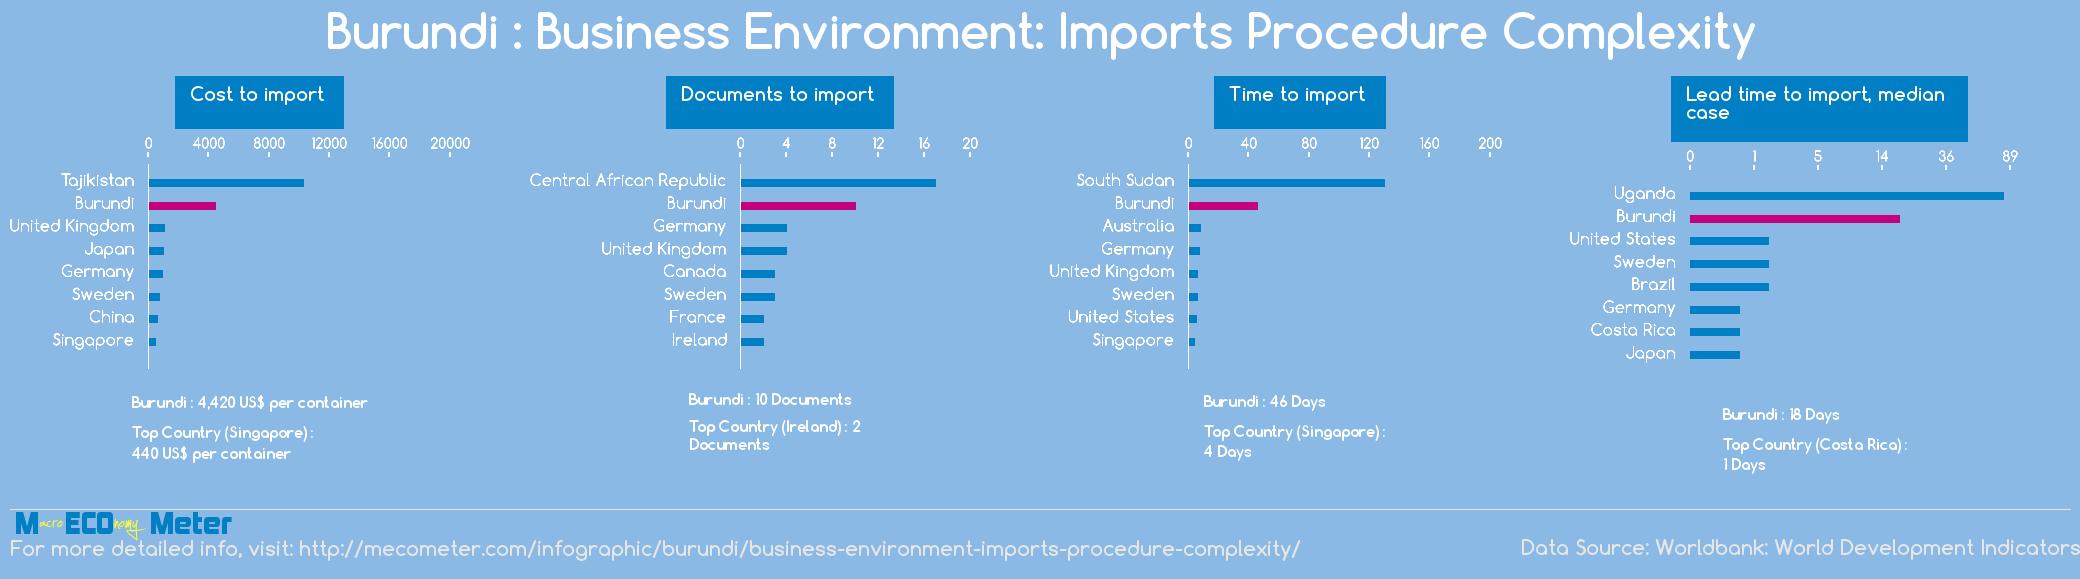 Burundi : Business Environment: Imports Procedure Complexity